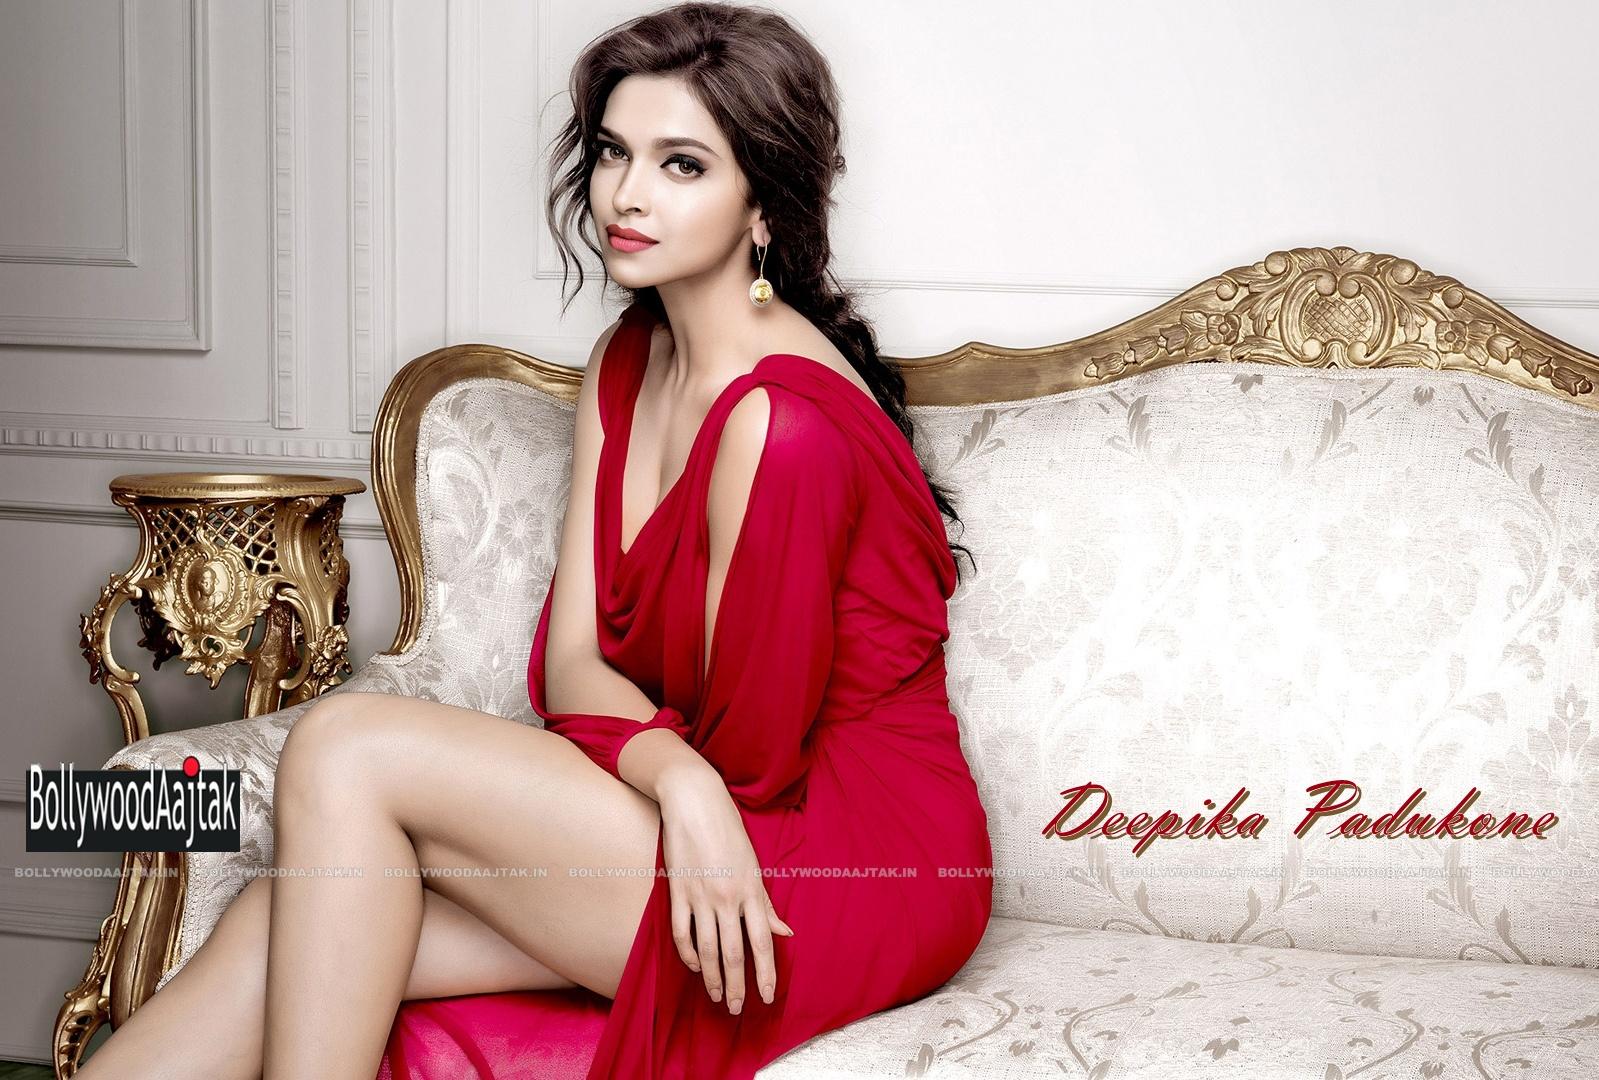 Deepika Padukone Wallpapers: Deepika Padukone Latest Hot